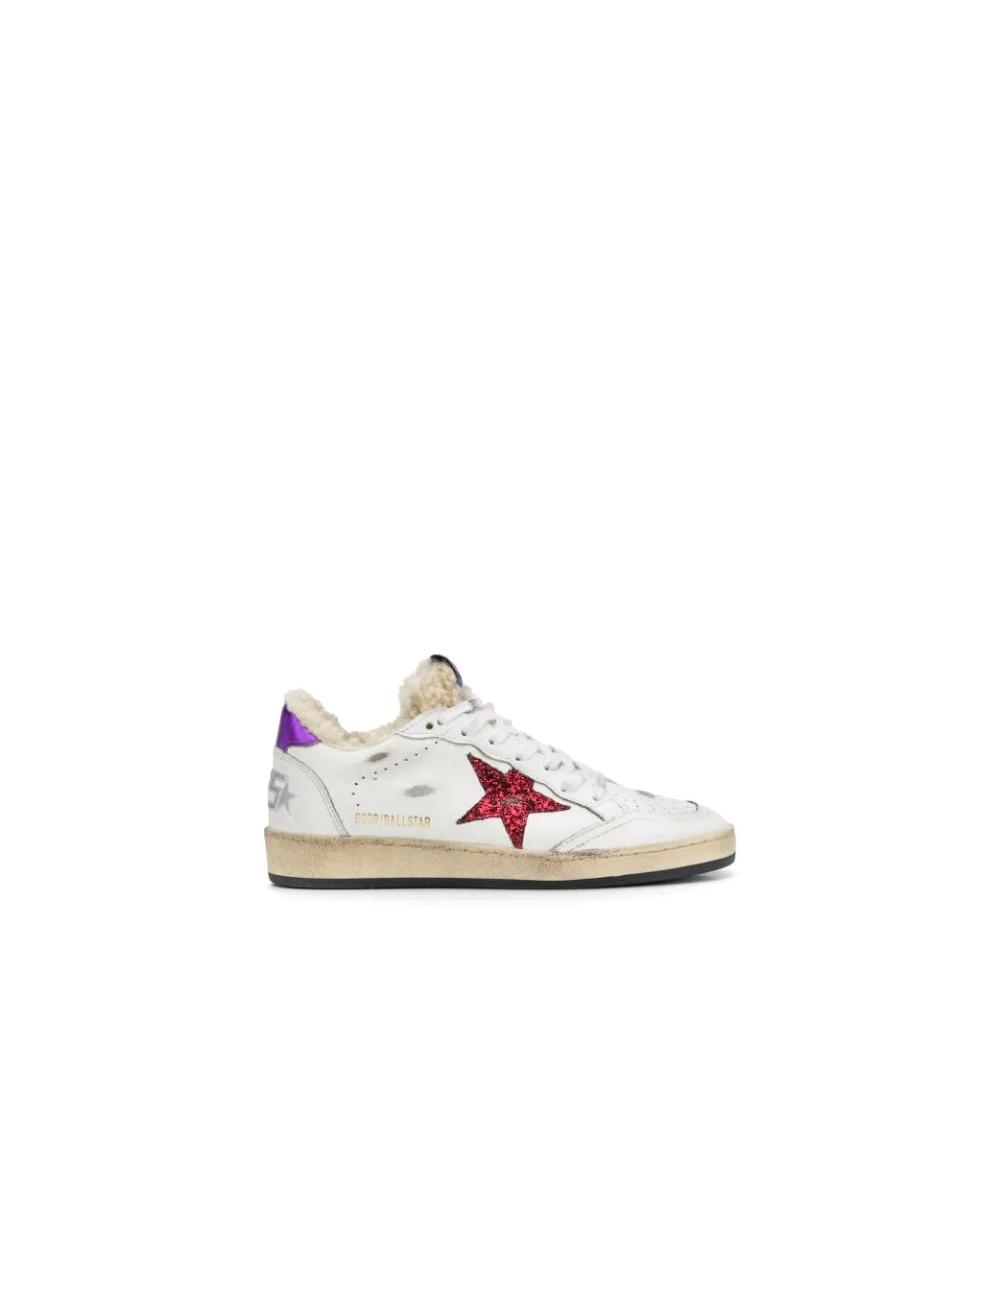 Ball star sneakers Golden Goose - BIG BOSS MEGEVE